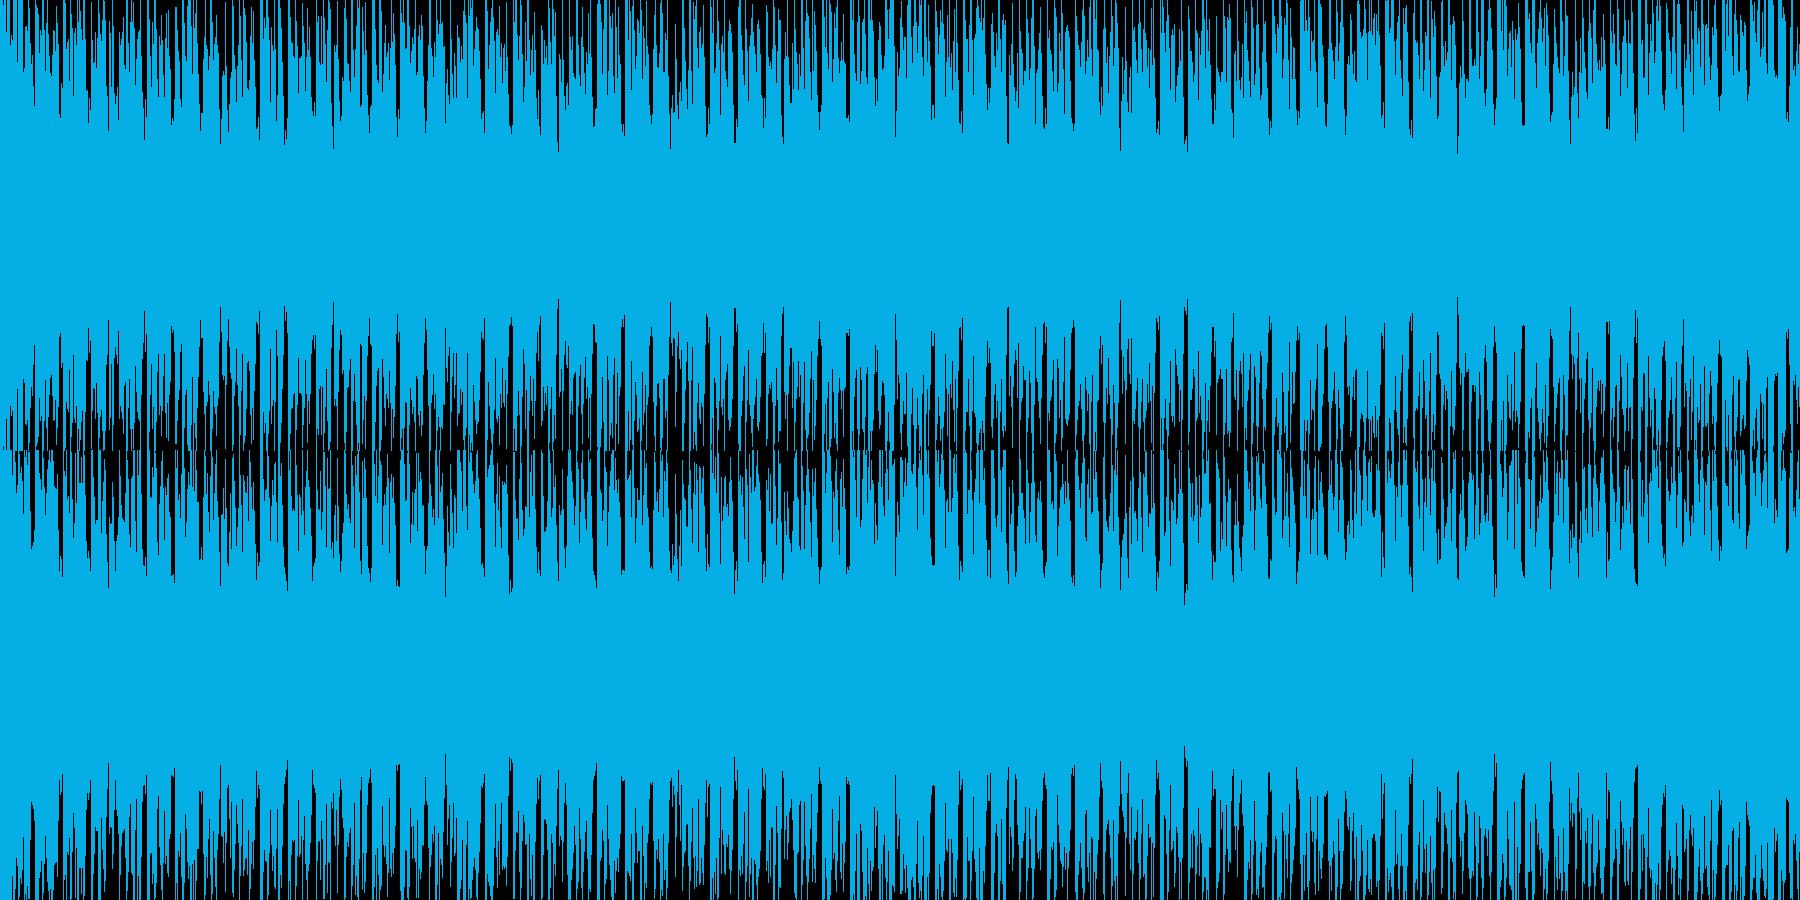 【EDMループ素材】企業・映像制作向きBの再生済みの波形